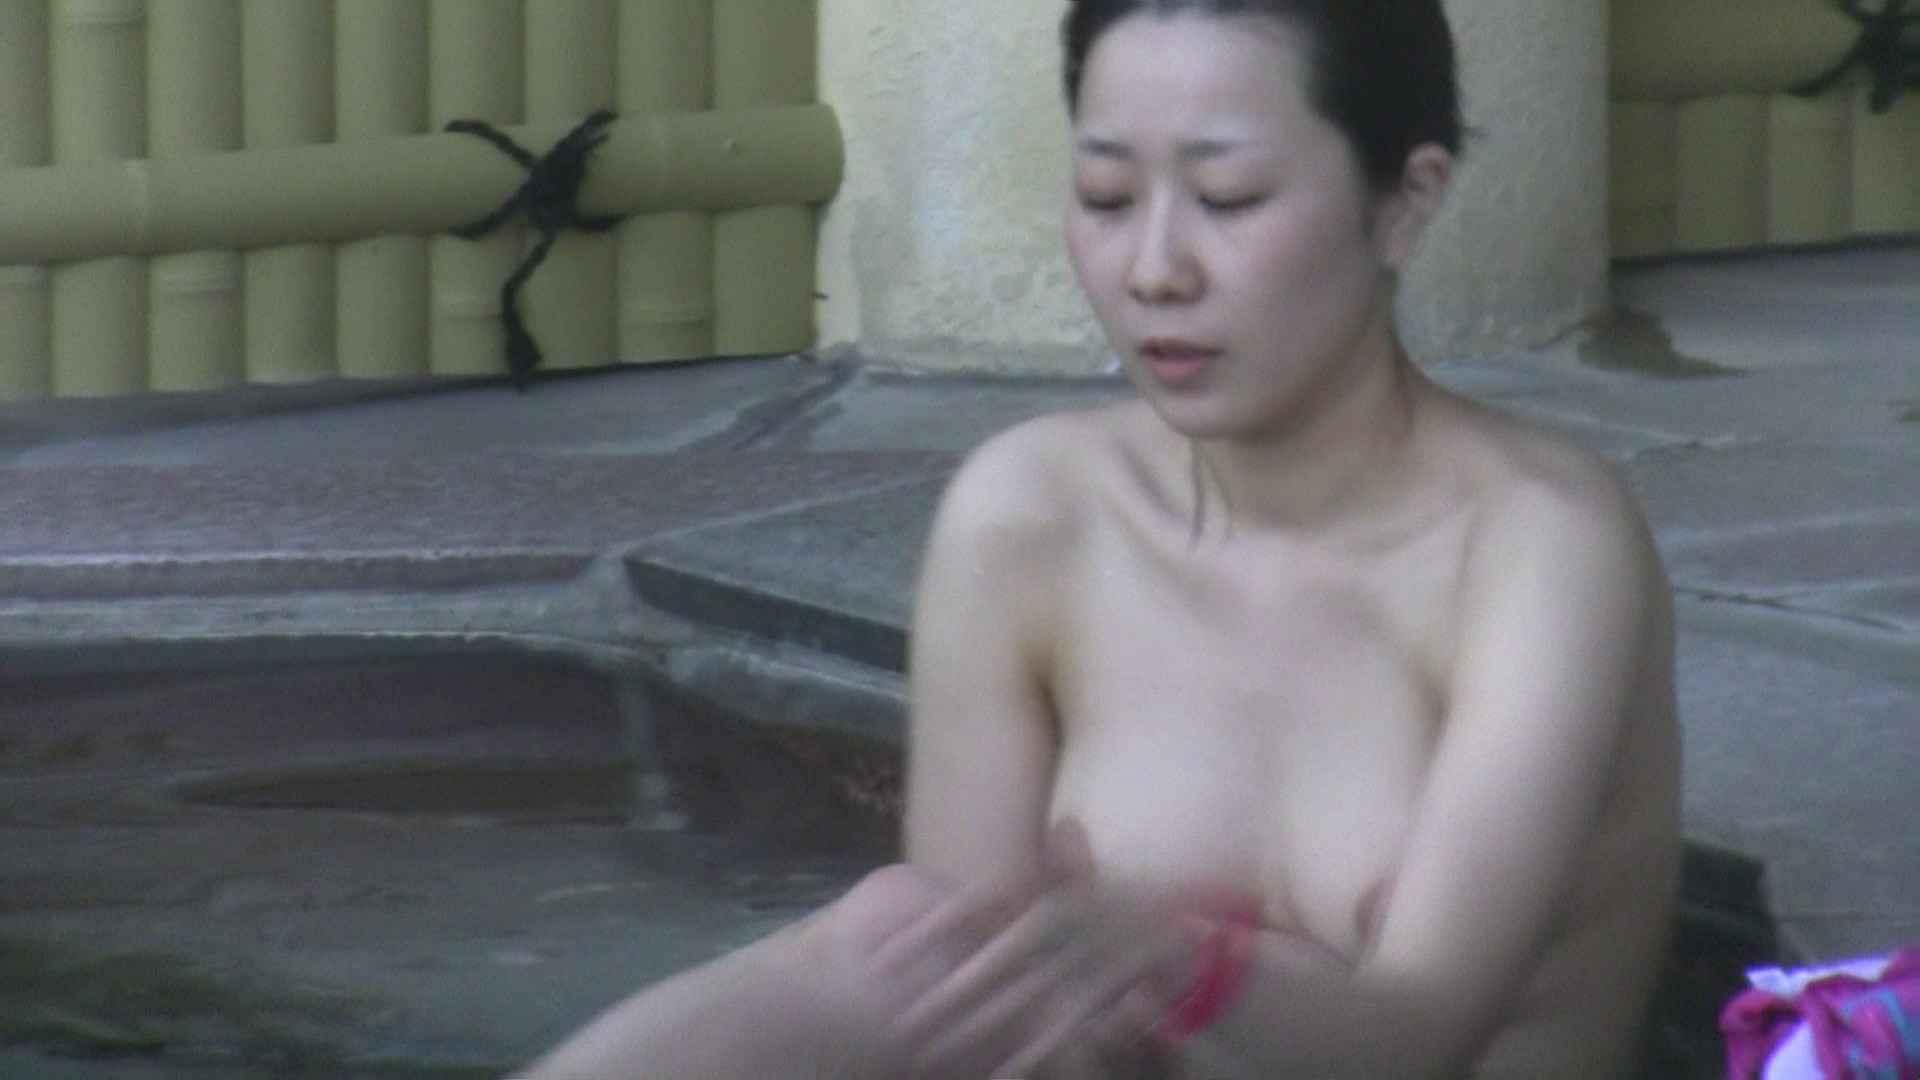 Aquaな露天風呂Vol.88【VIP限定】 綺麗なOLたち | 盗撮  57枚 19